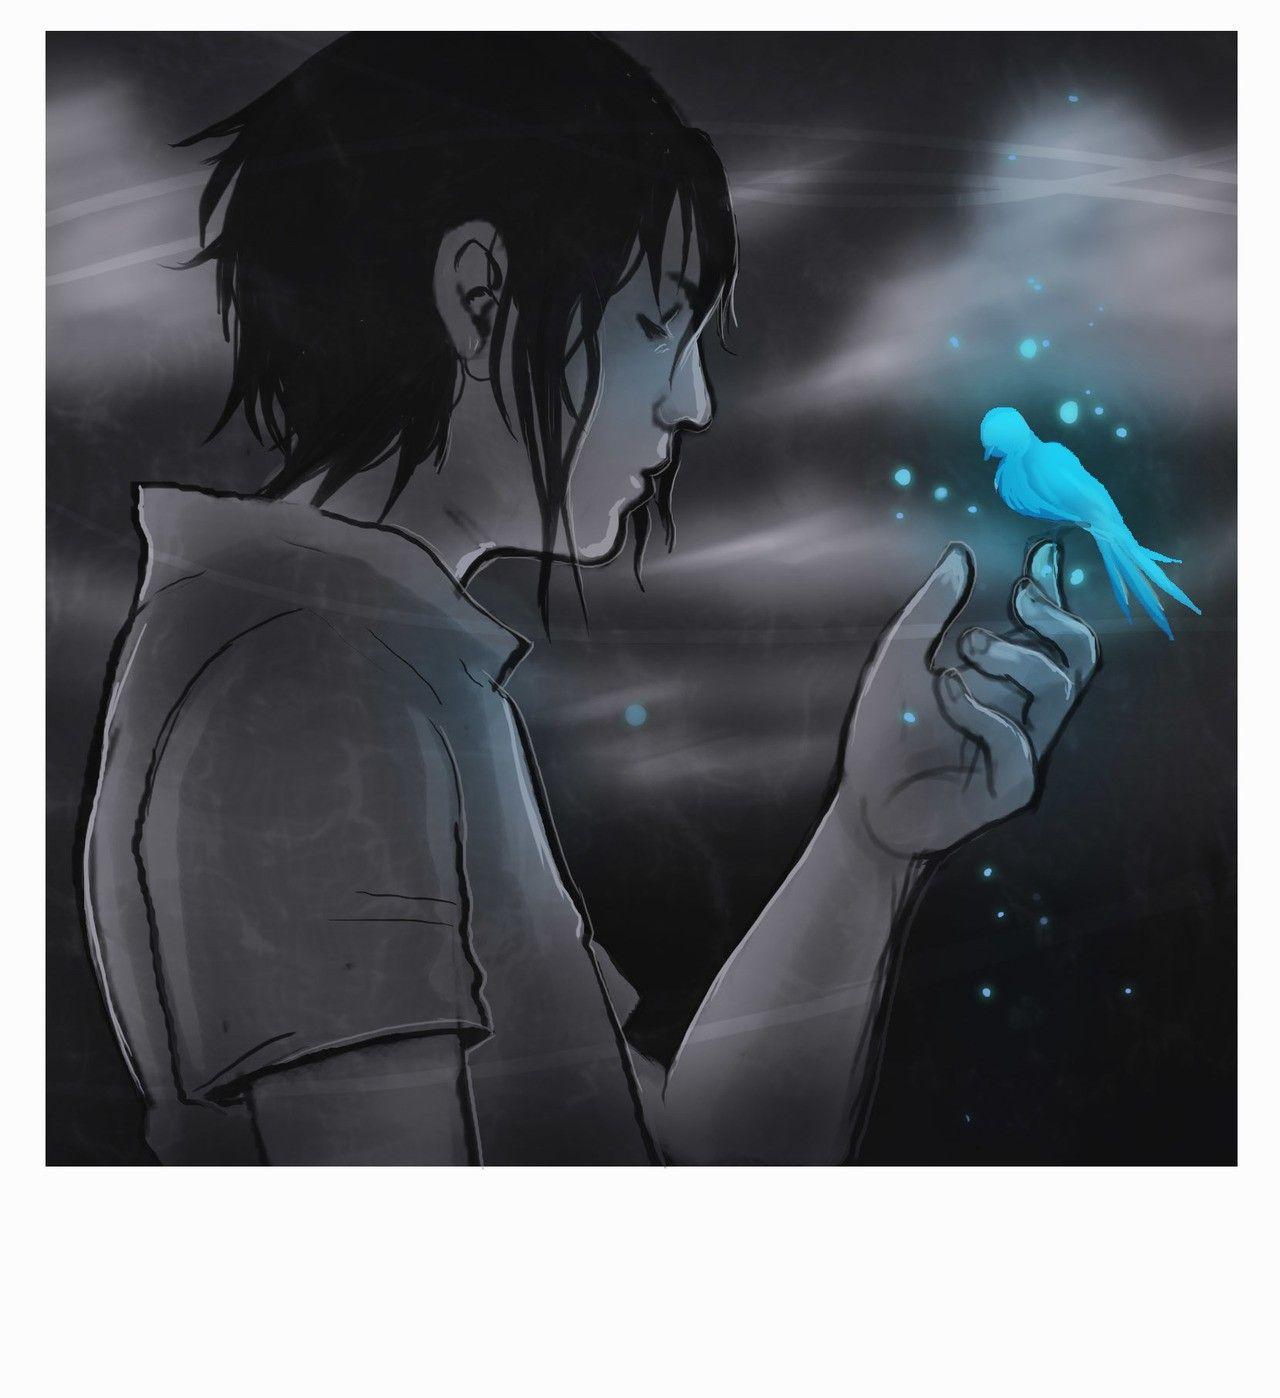 Épinglé par Justllne sur Sasuke